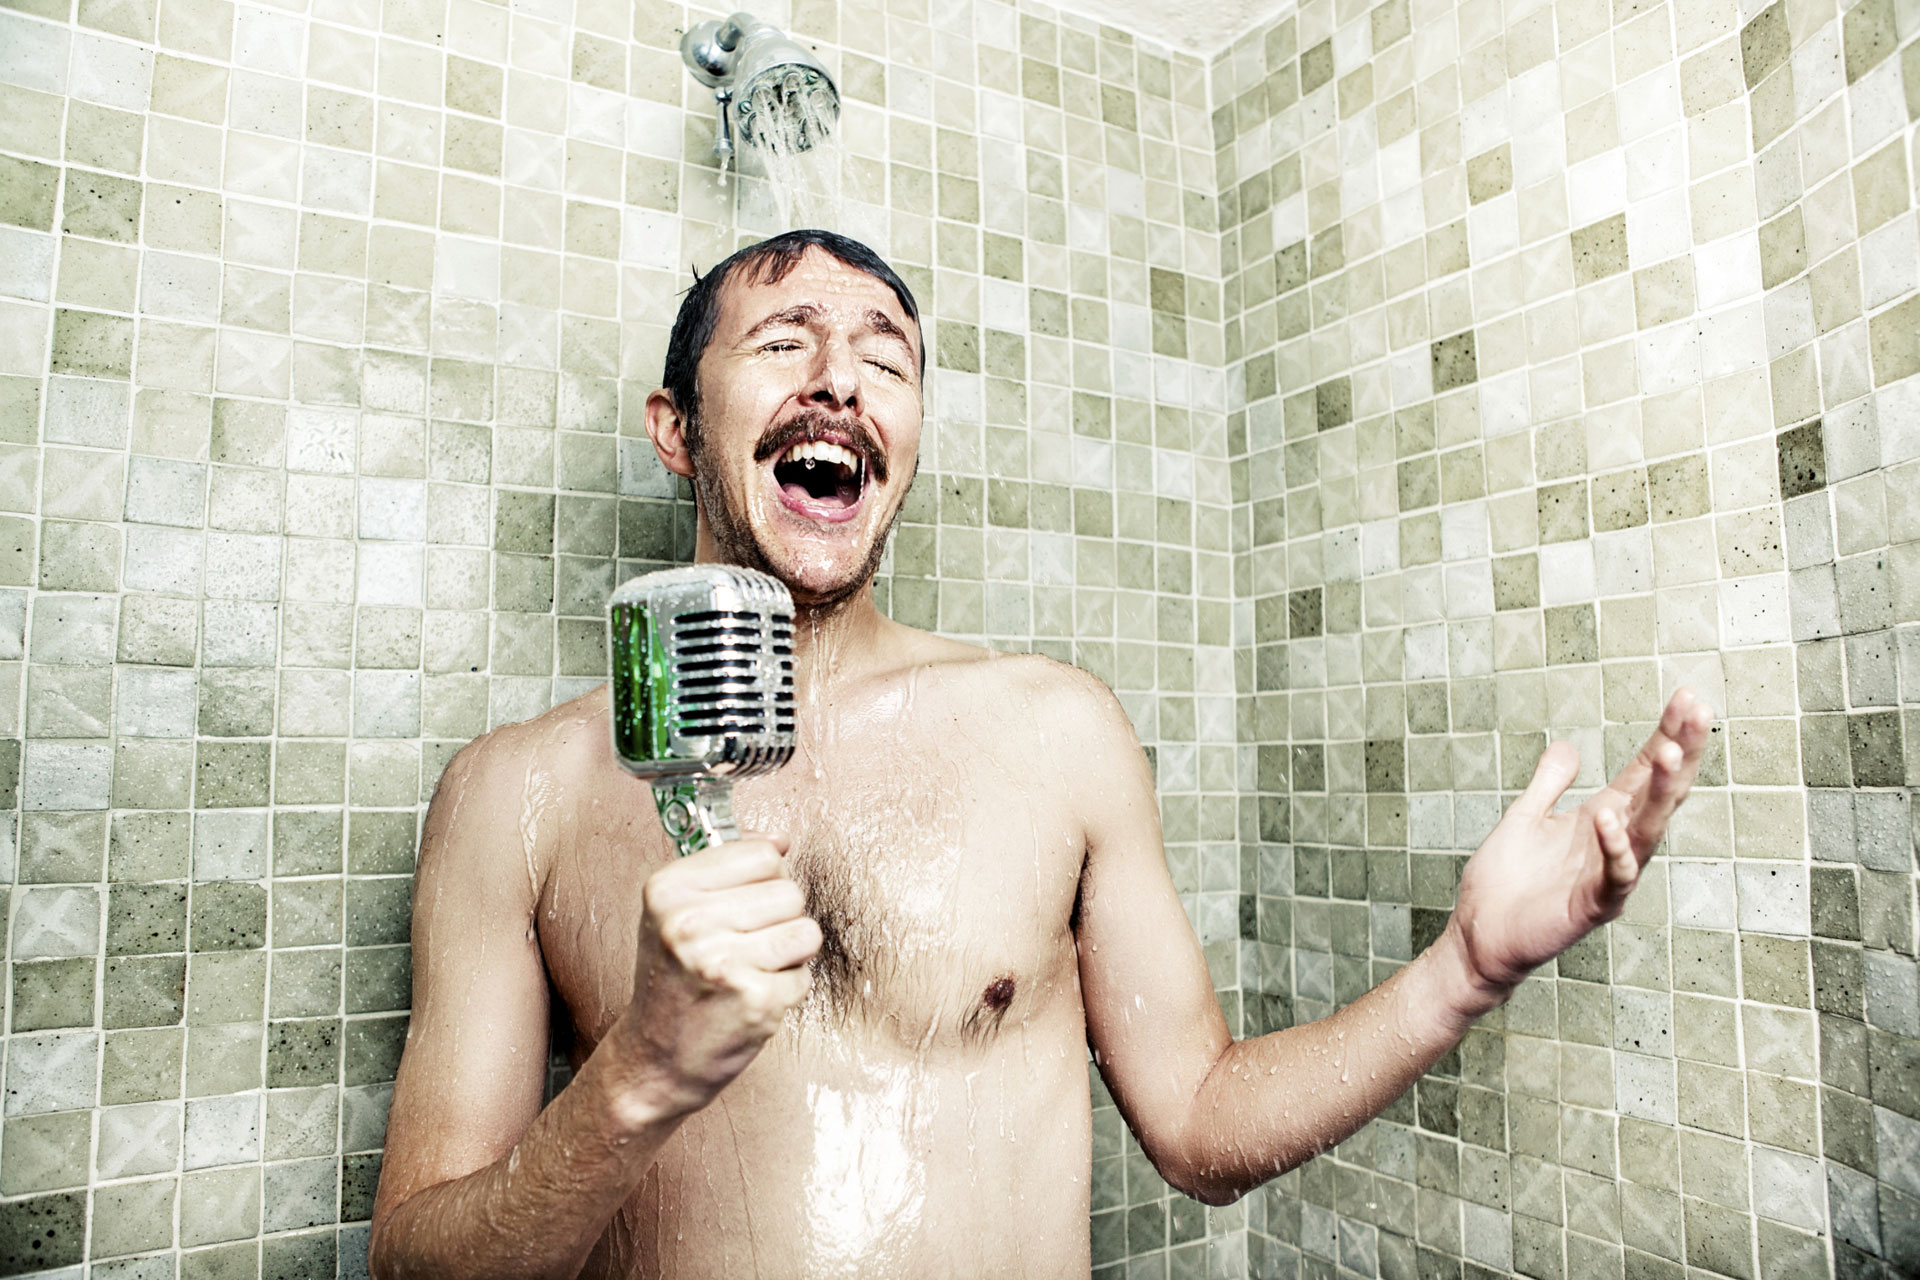 Man singing in shower